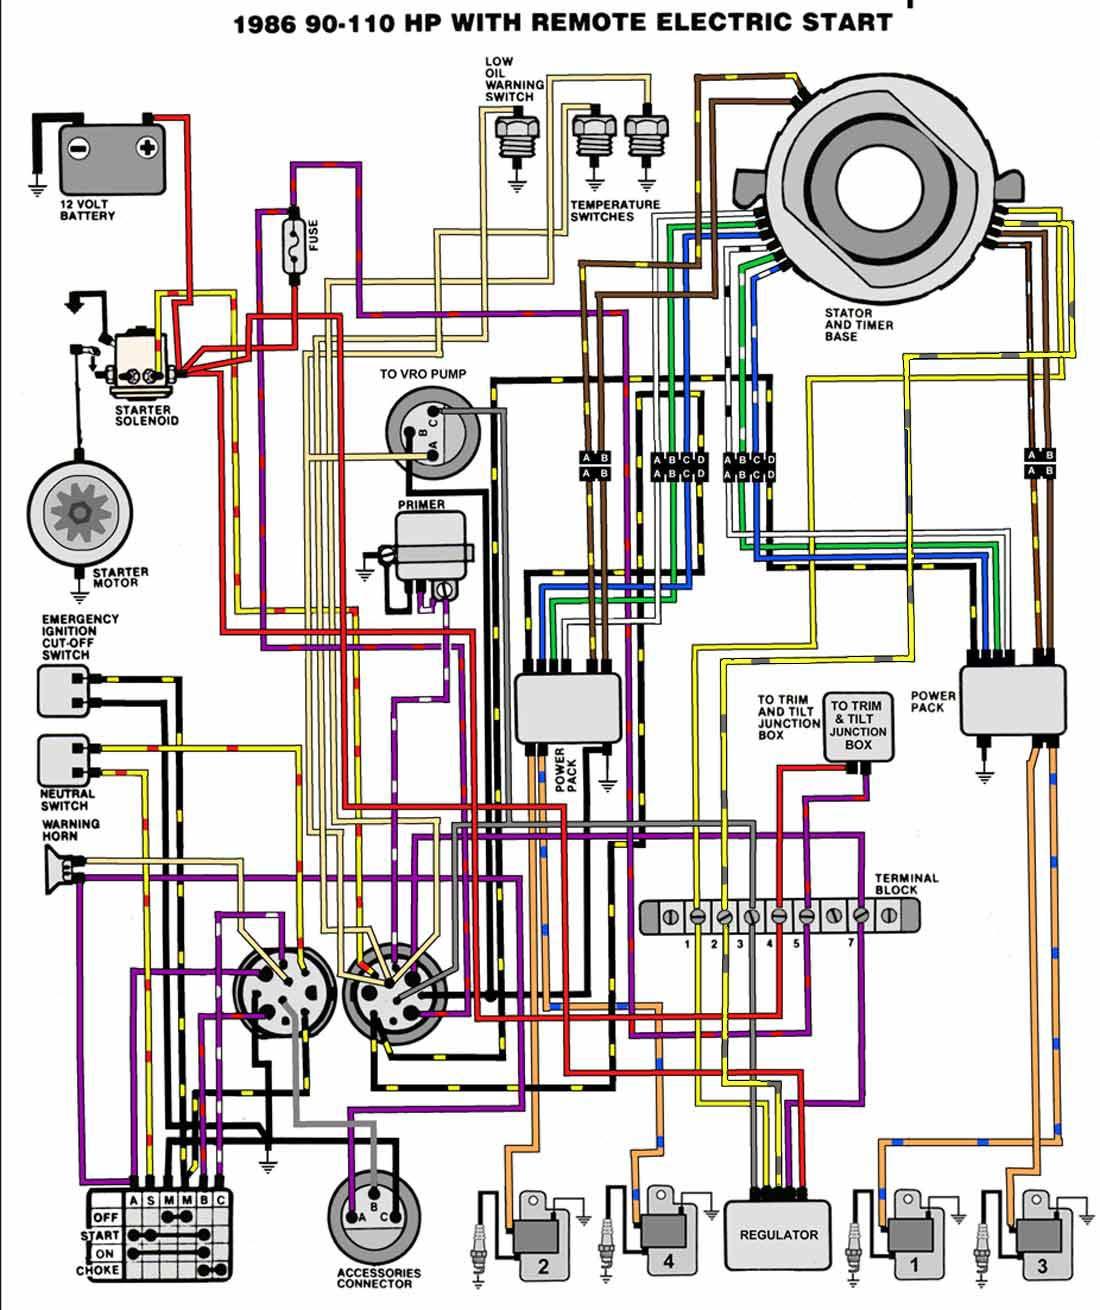 0583653 Omc Wiring Diagram Just Wirings Harness Schematics Rh Enr Green Com Johnson